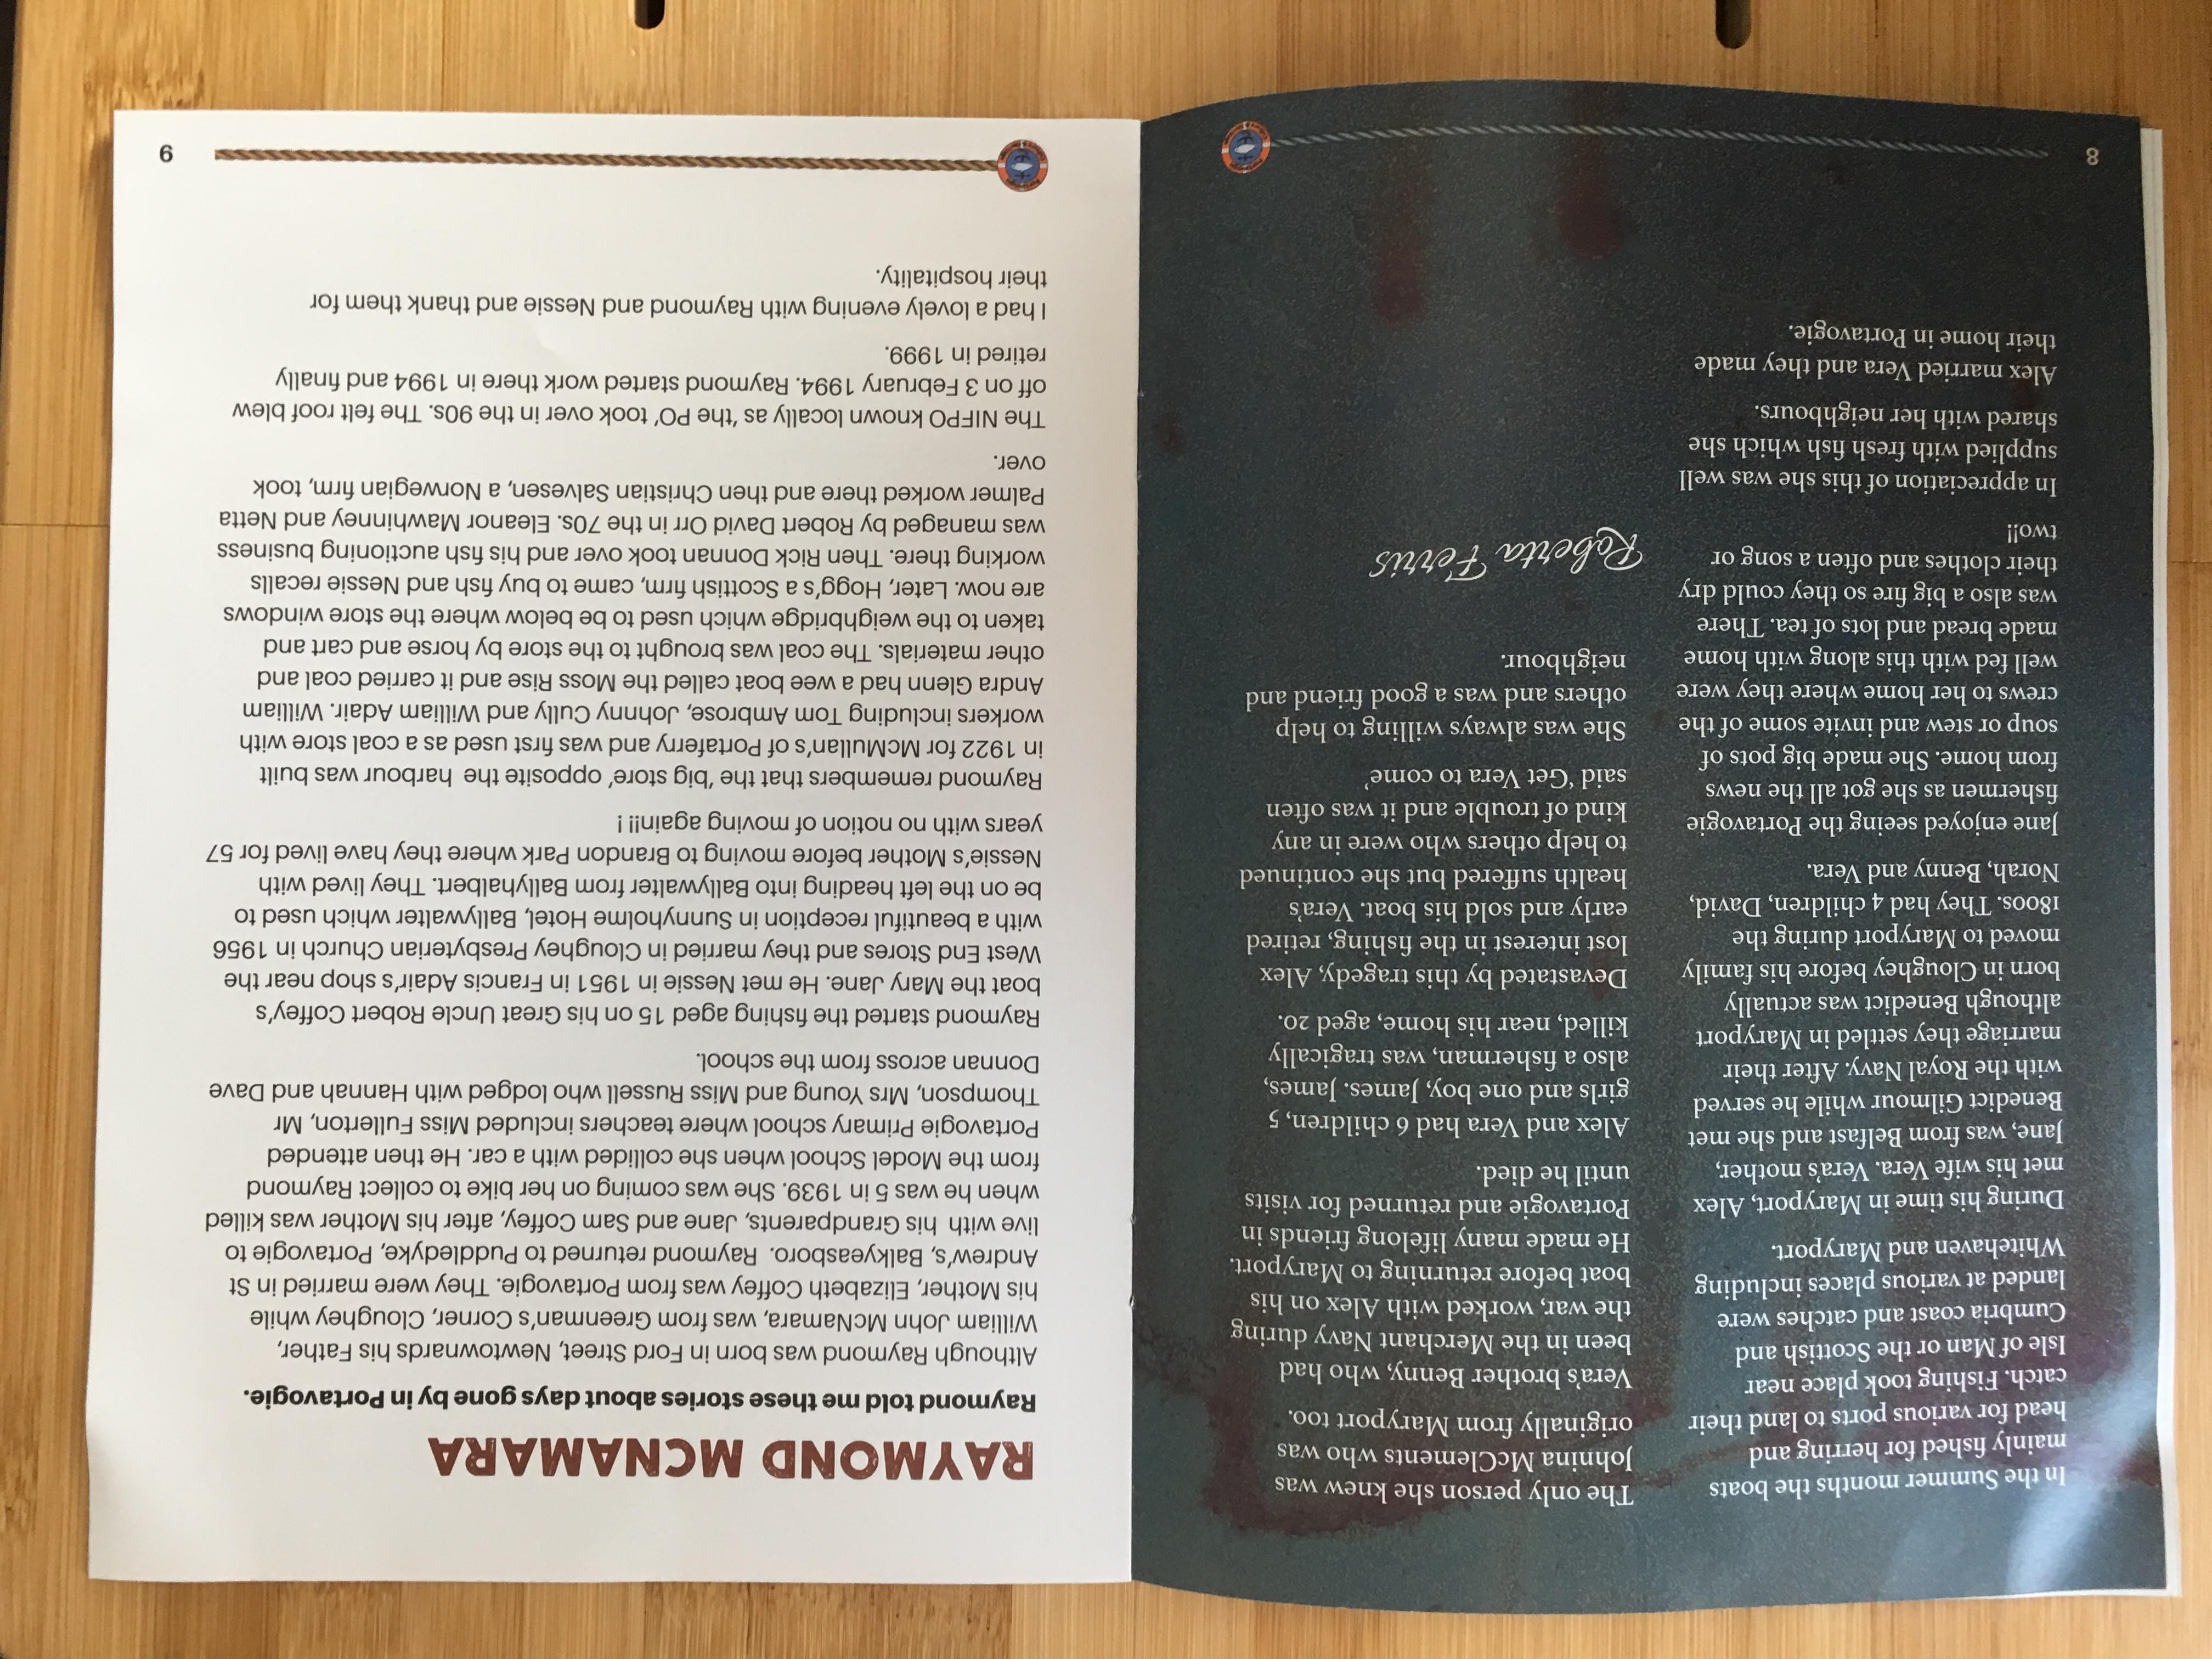 pg 8-9